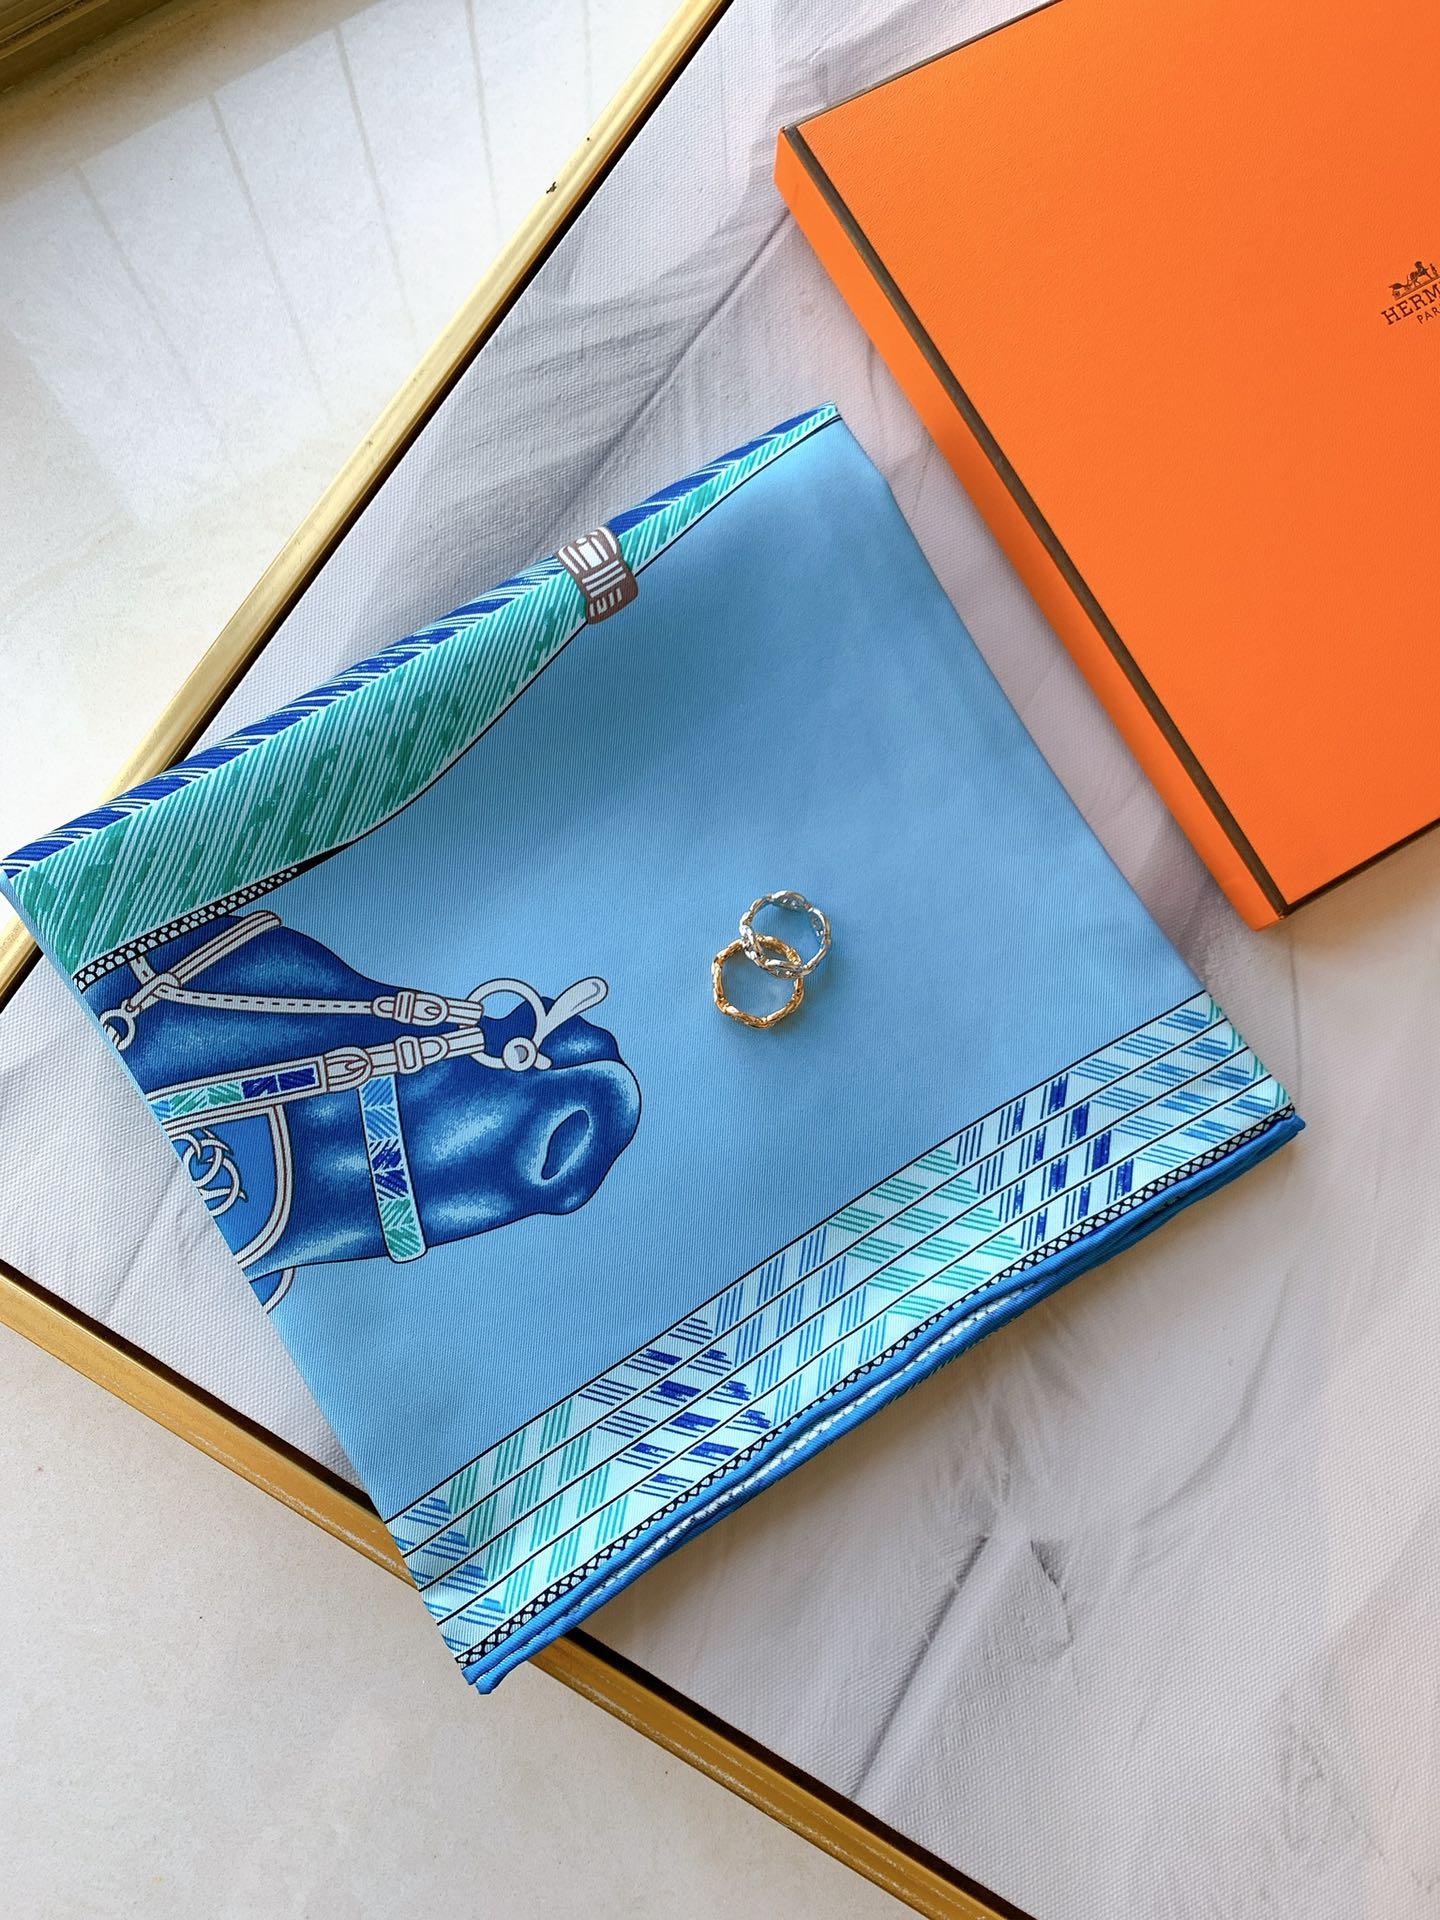 Hermes 新季度《骏马披挂》蚕丝方巾 《天空蓝》 20年新版骏马图案丝巾